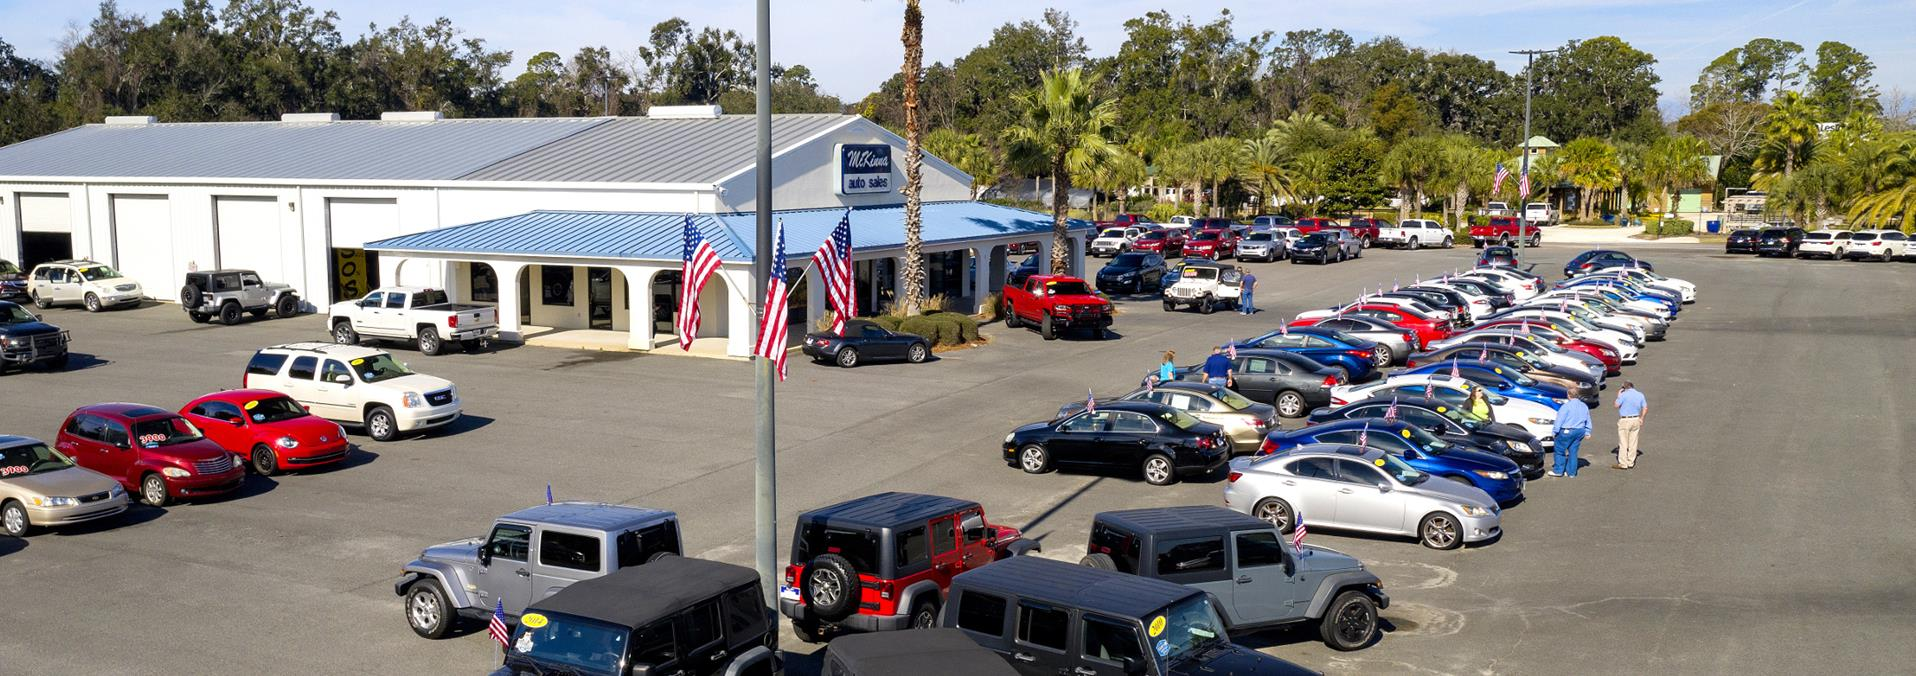 Budget Rental Car Sales >> Mckinna Auto Sales In Brunswick Ga Quality Affordable Used